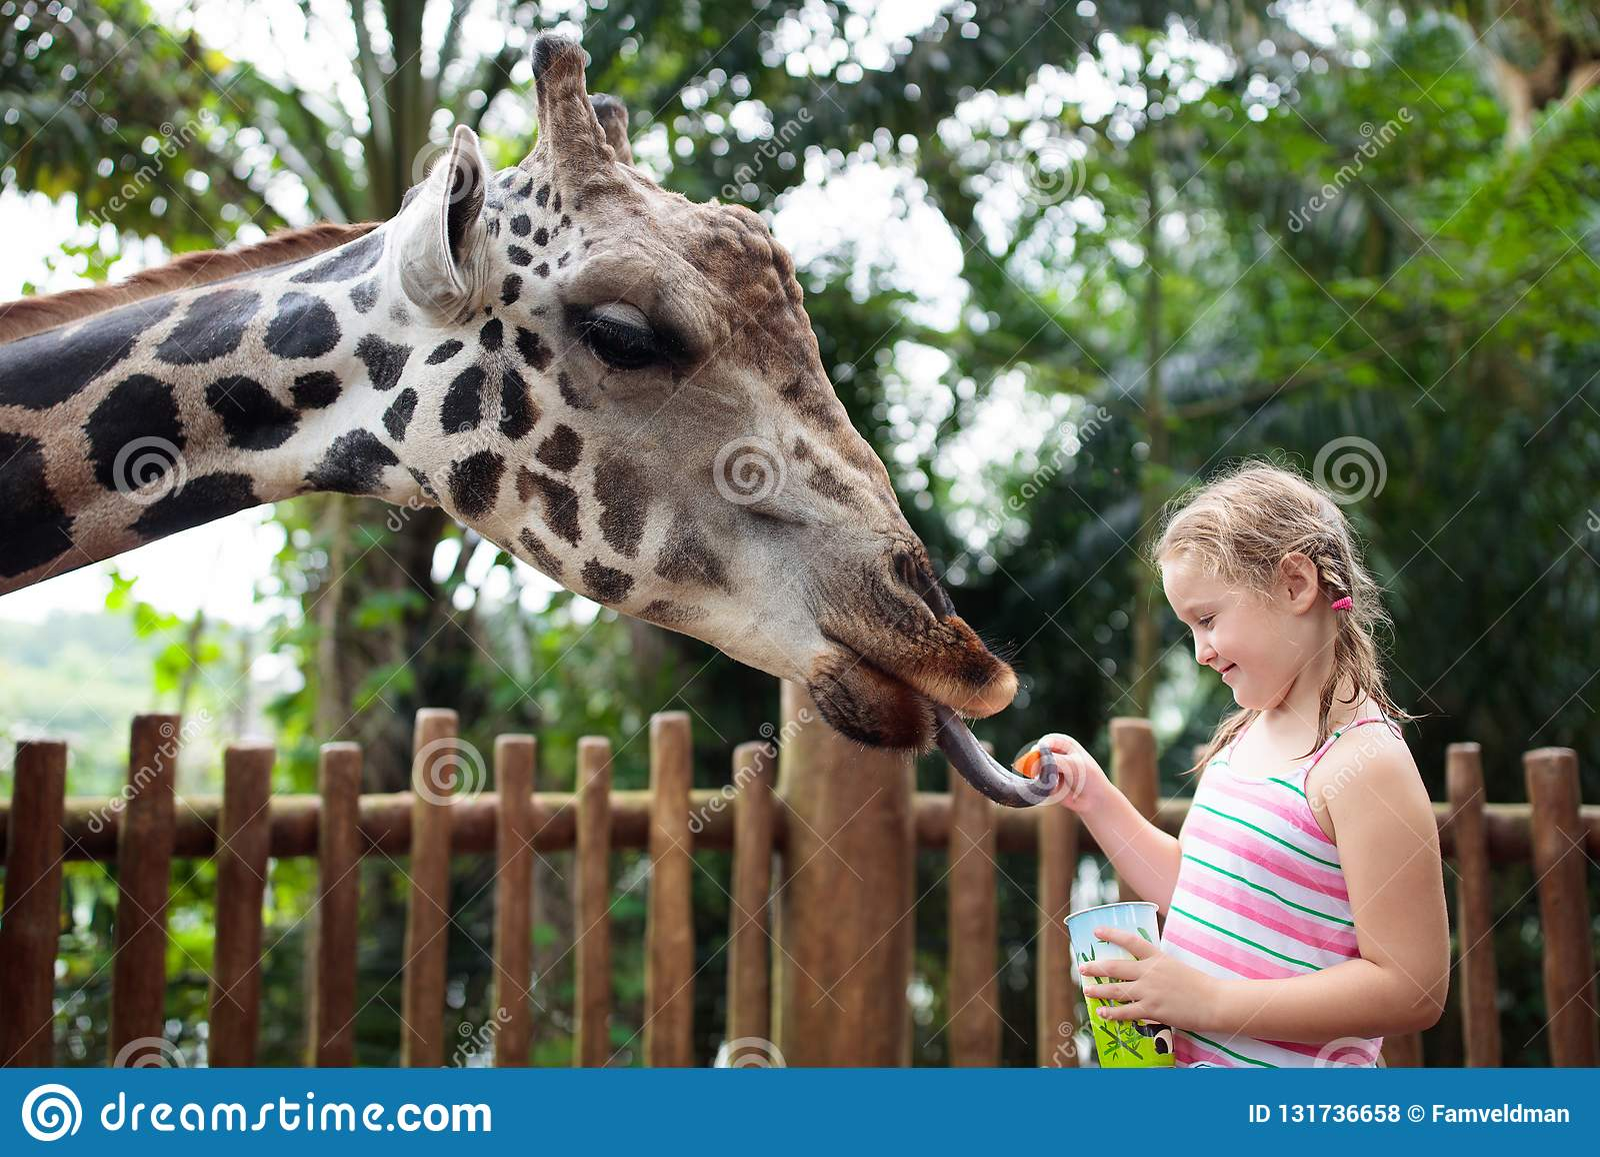 Family feeding giraffe in zoo. Children feed giraffes in tropical safari park during summer vacation. Kids watch animals. Little